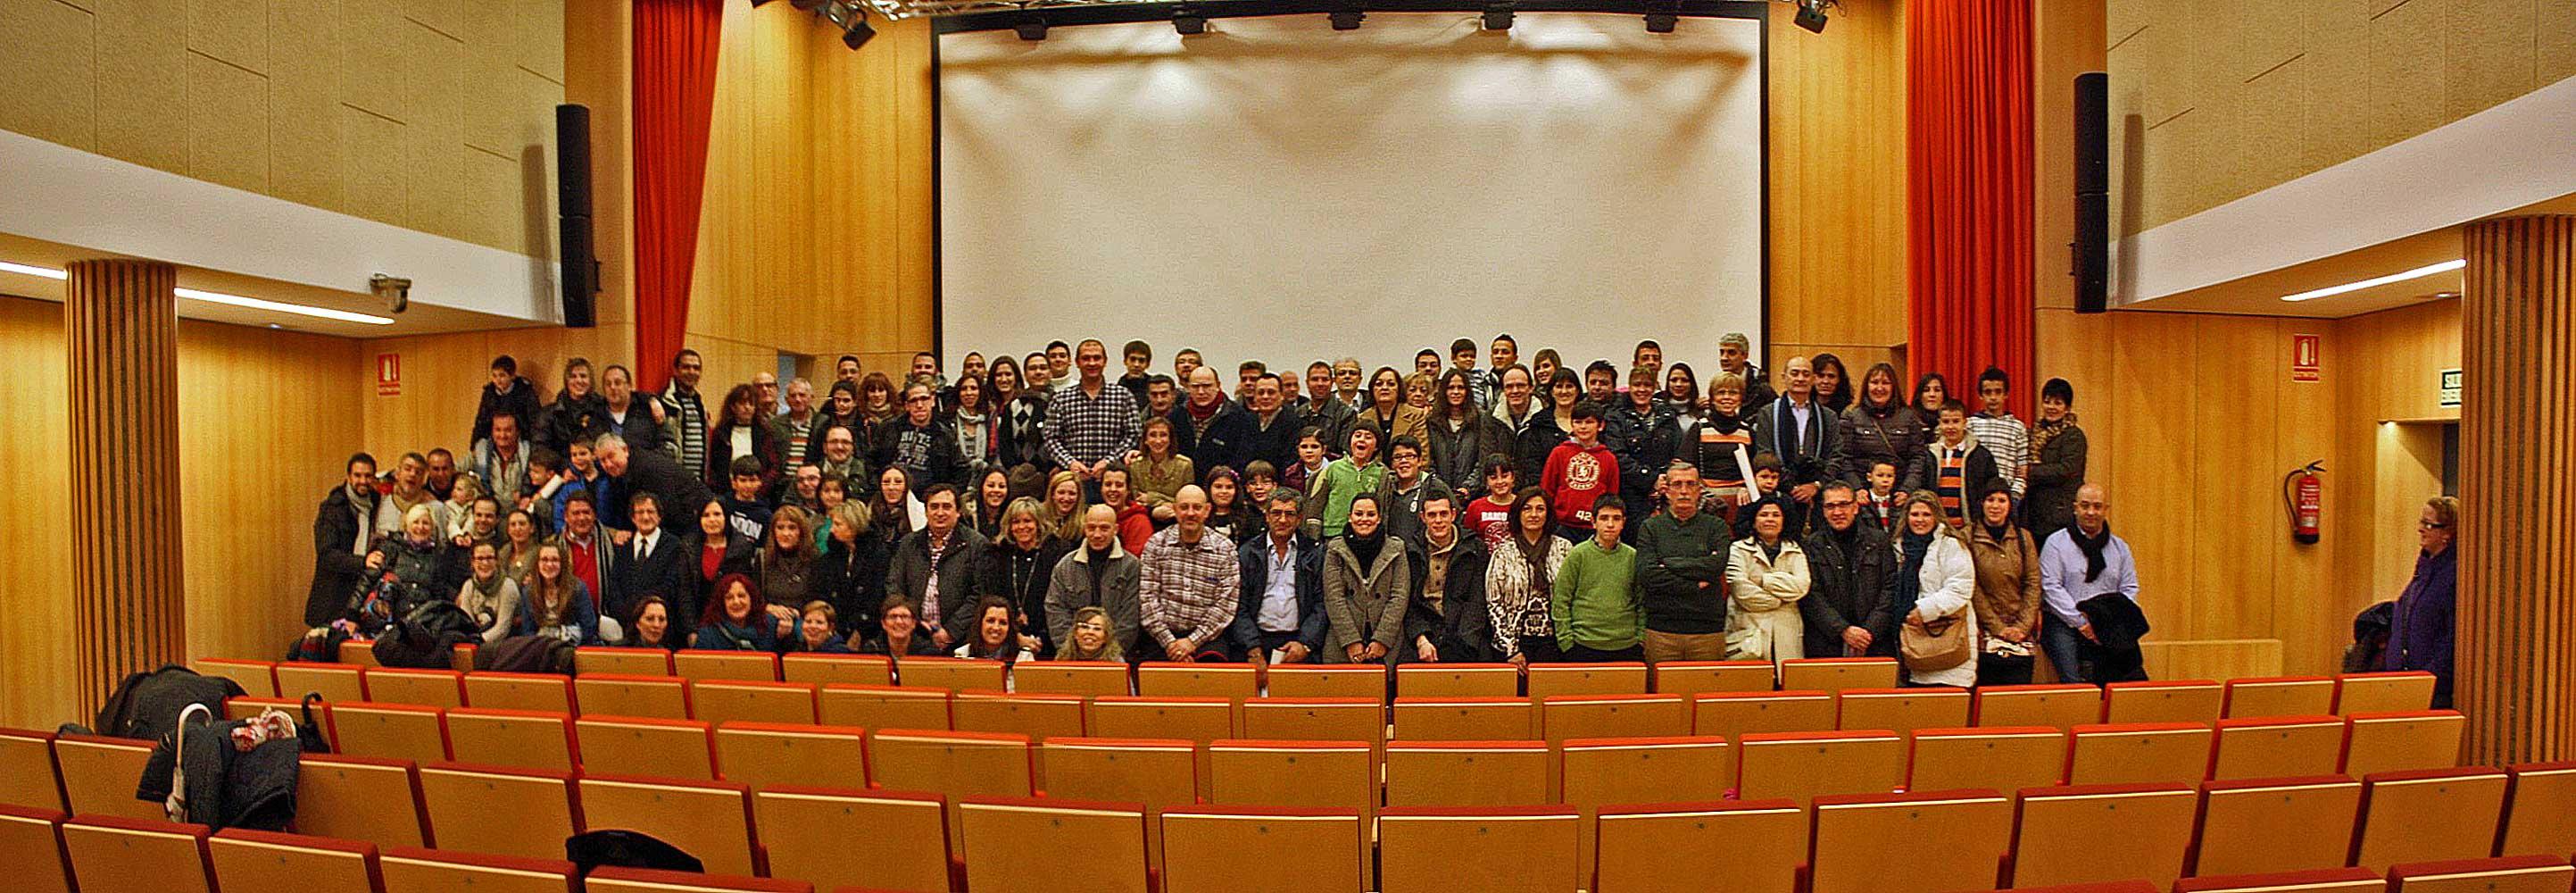 Cofradia Columna Zgz – Reunion De Instrumentos 2013